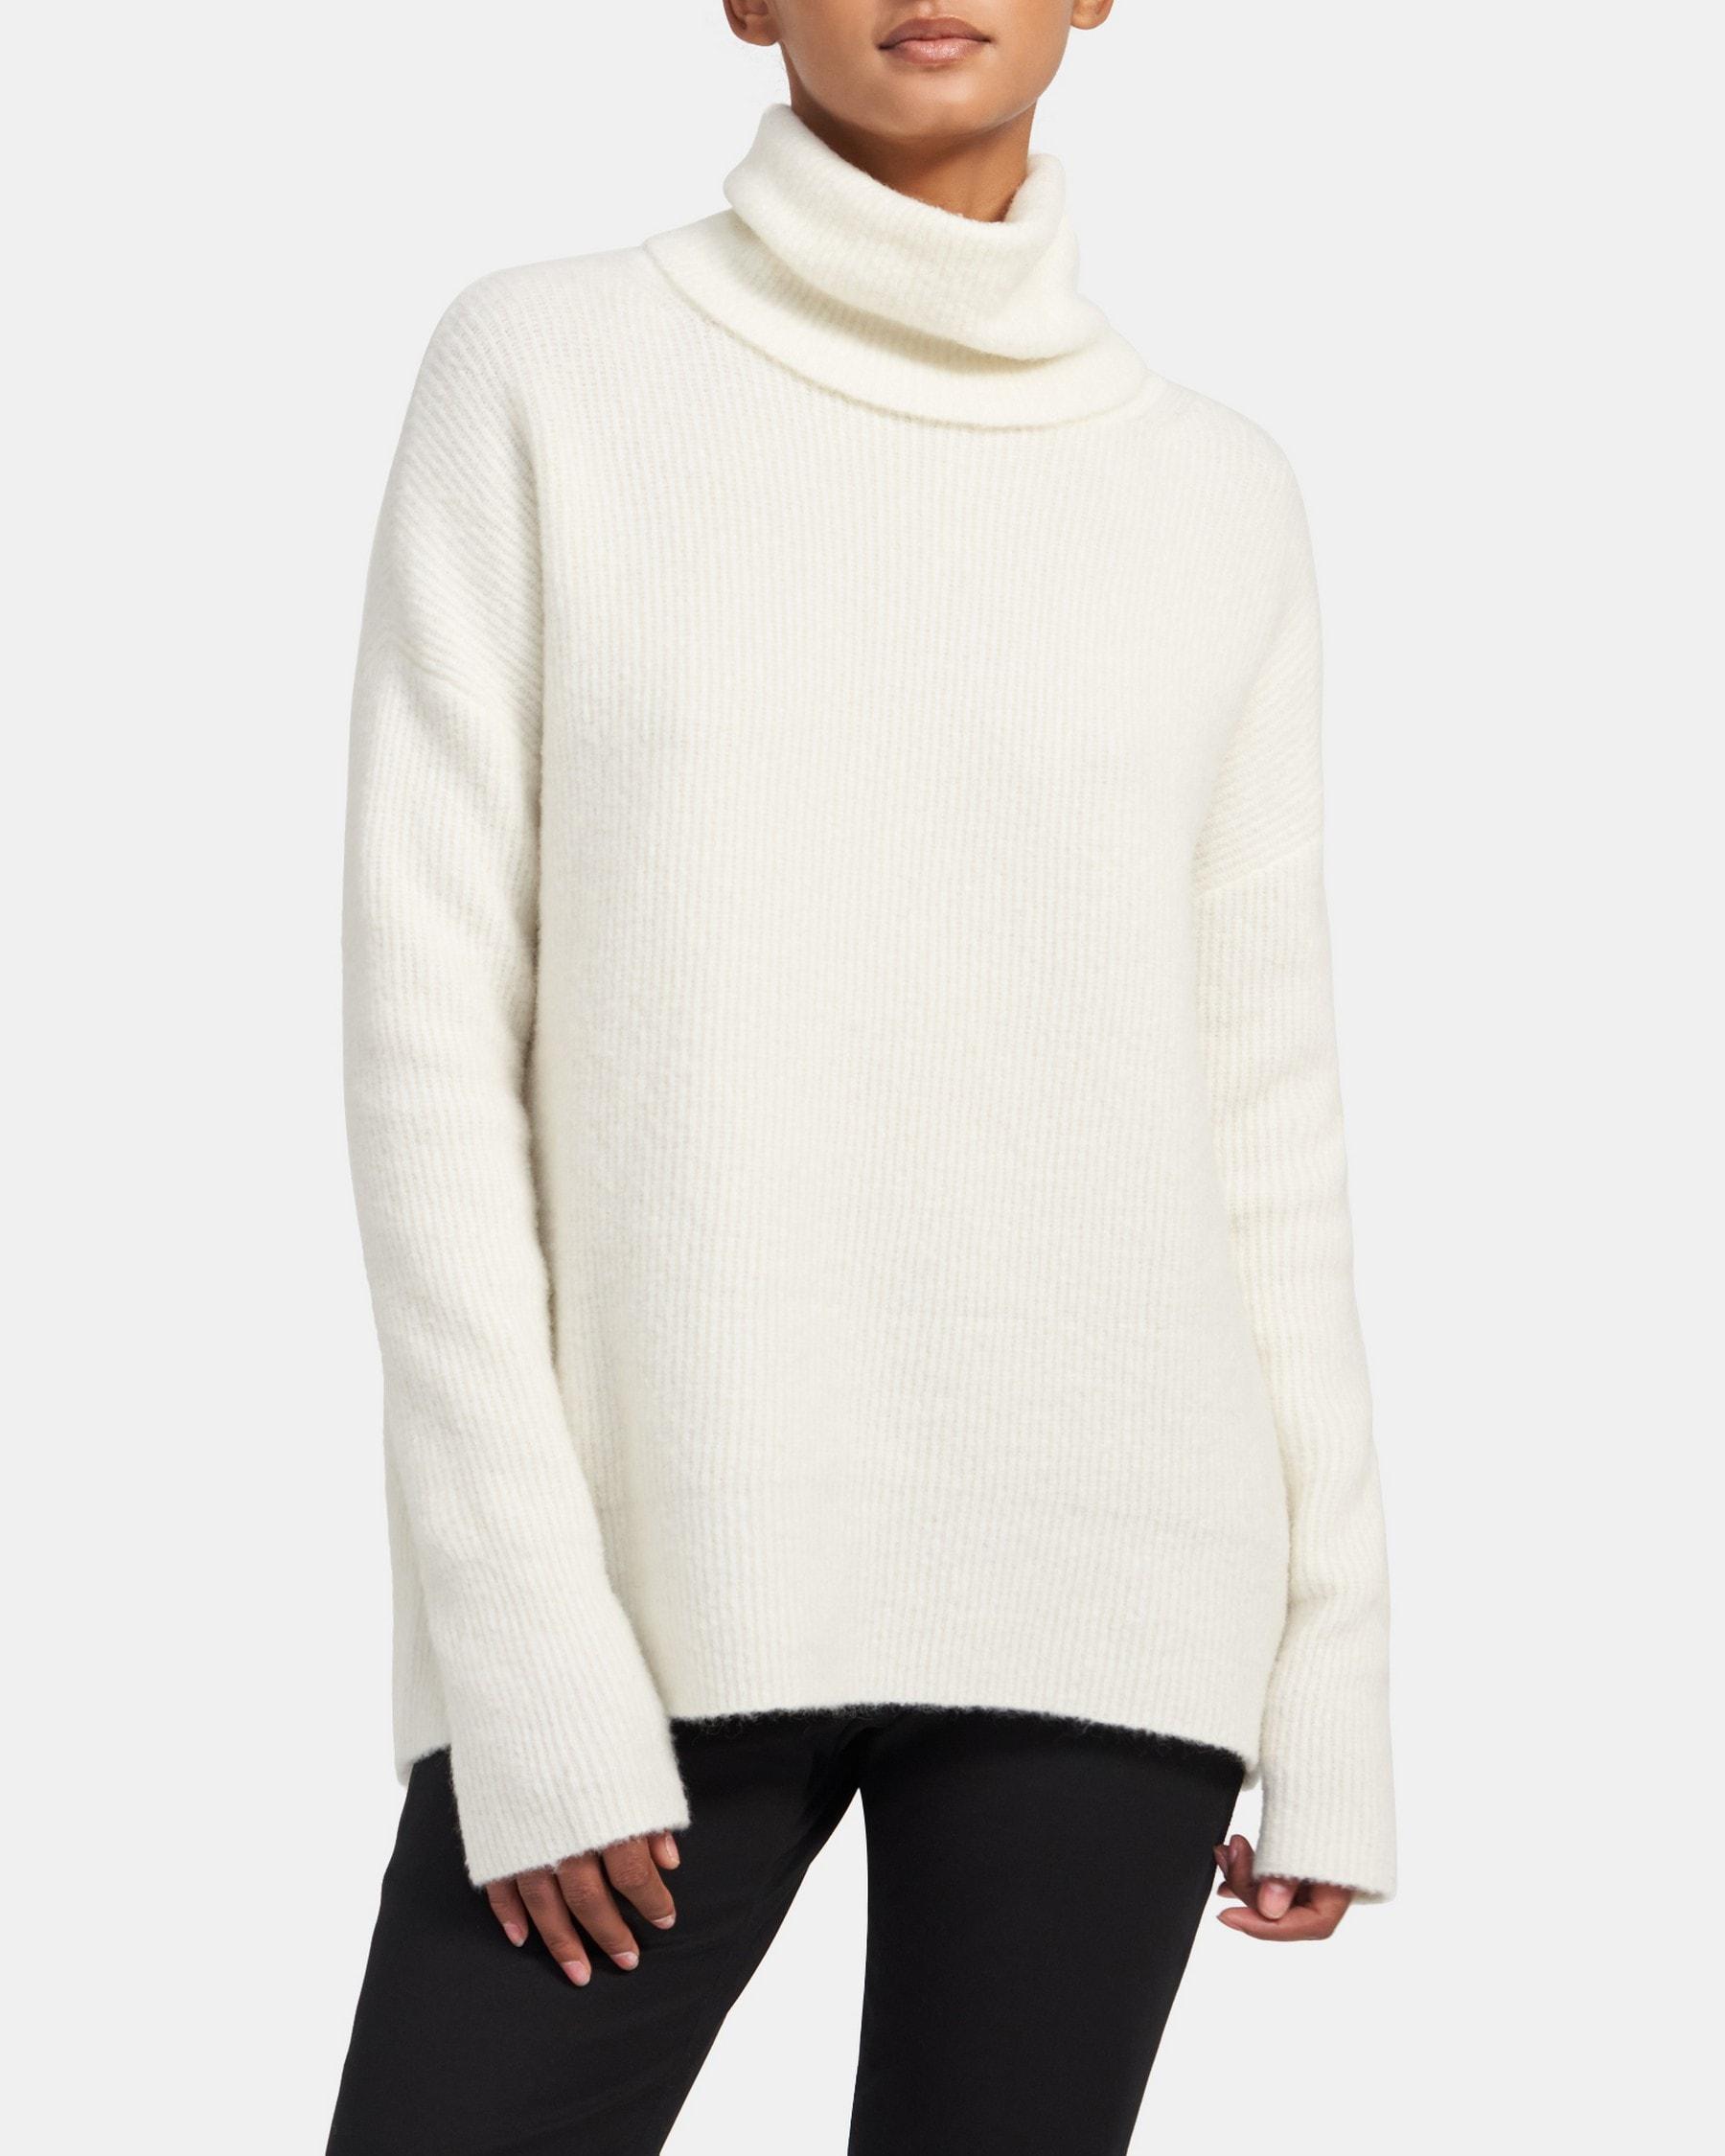 Theory Turtleneck Sweater in Cloud Wool